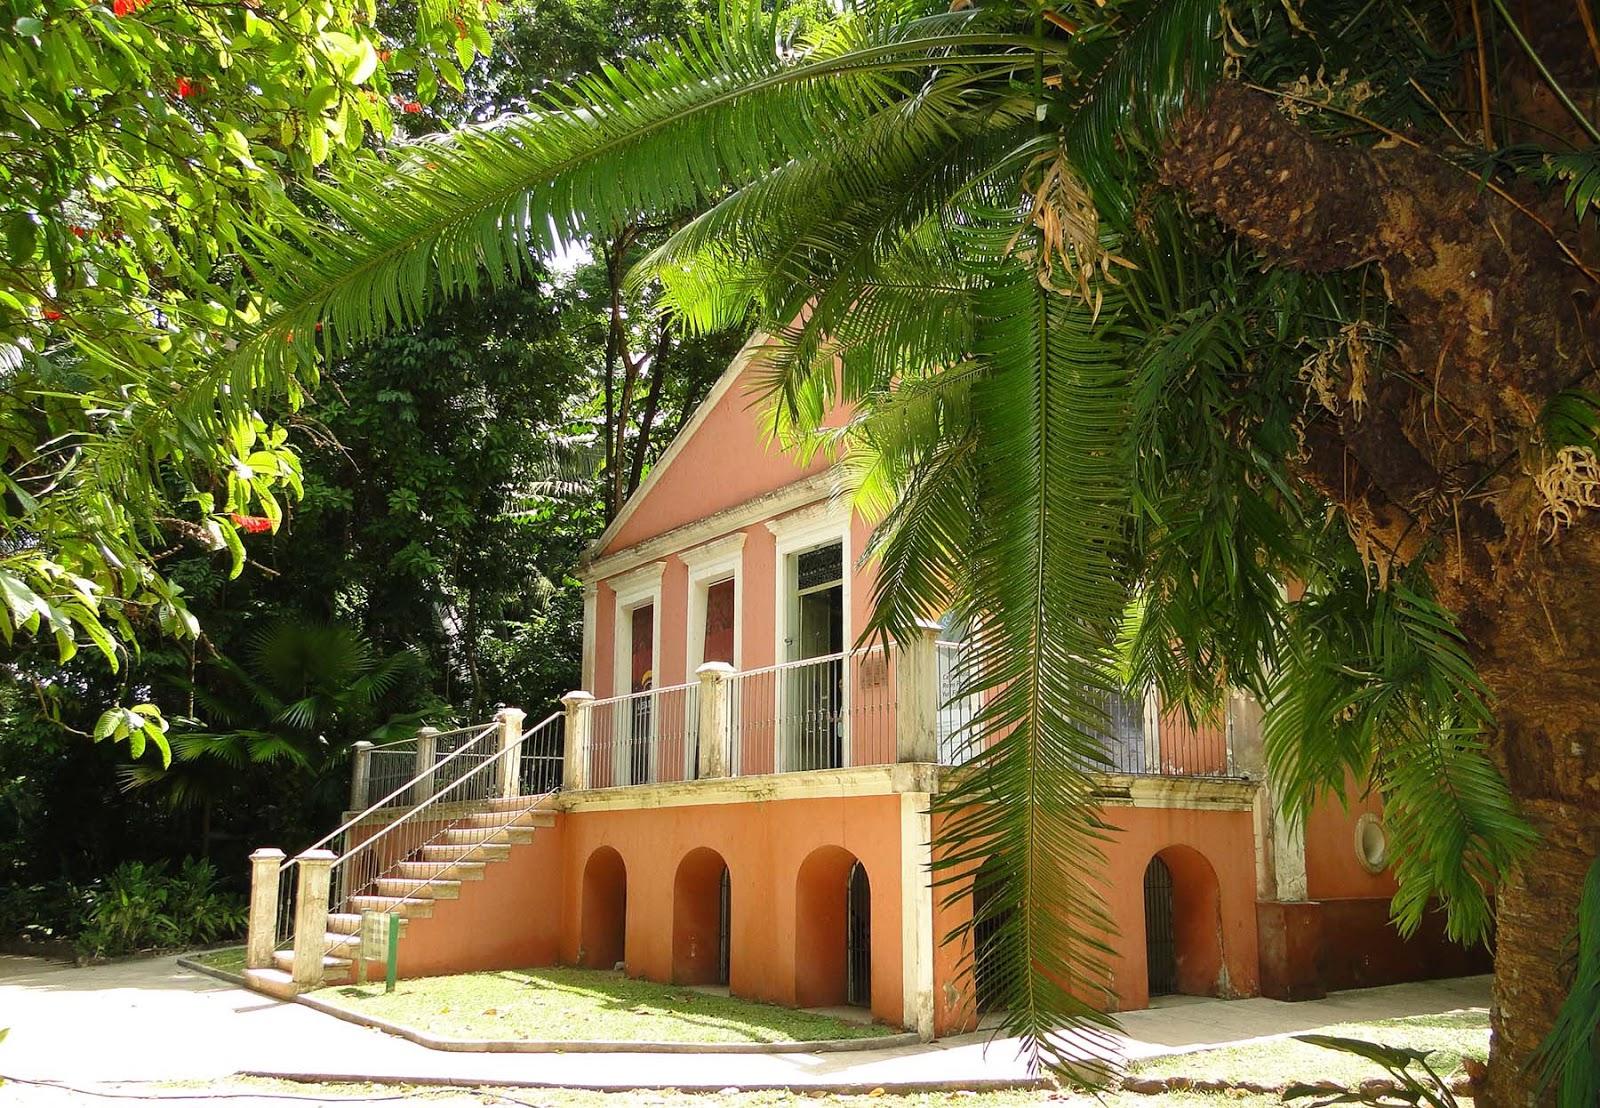 Museu Emílio Goeldi, Belém do Pará